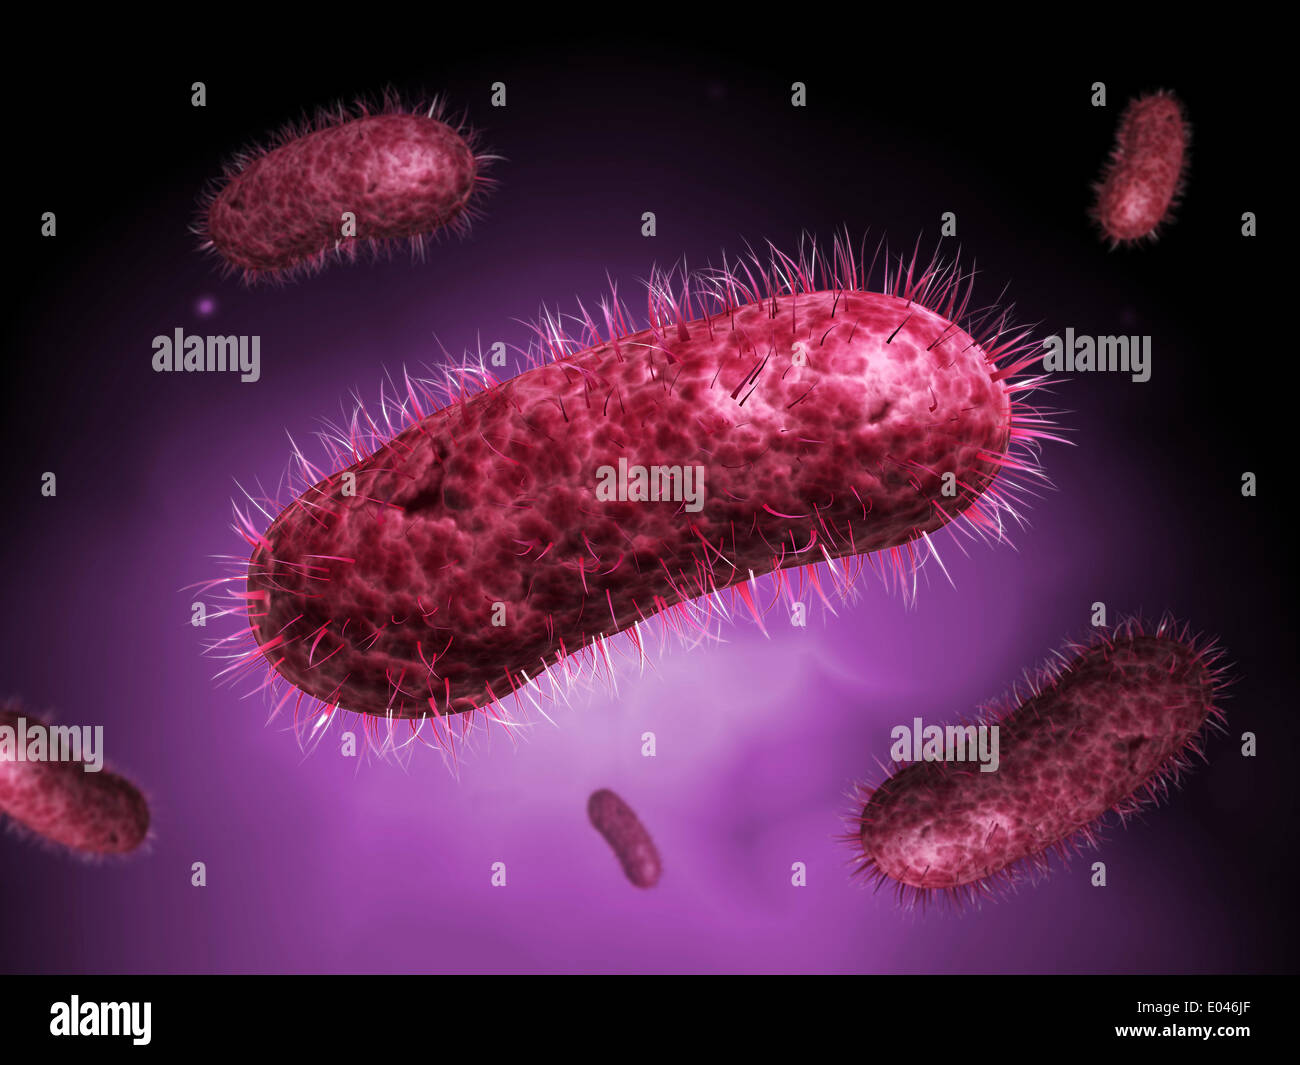 Microscopic view of bacteria. - Stock Image